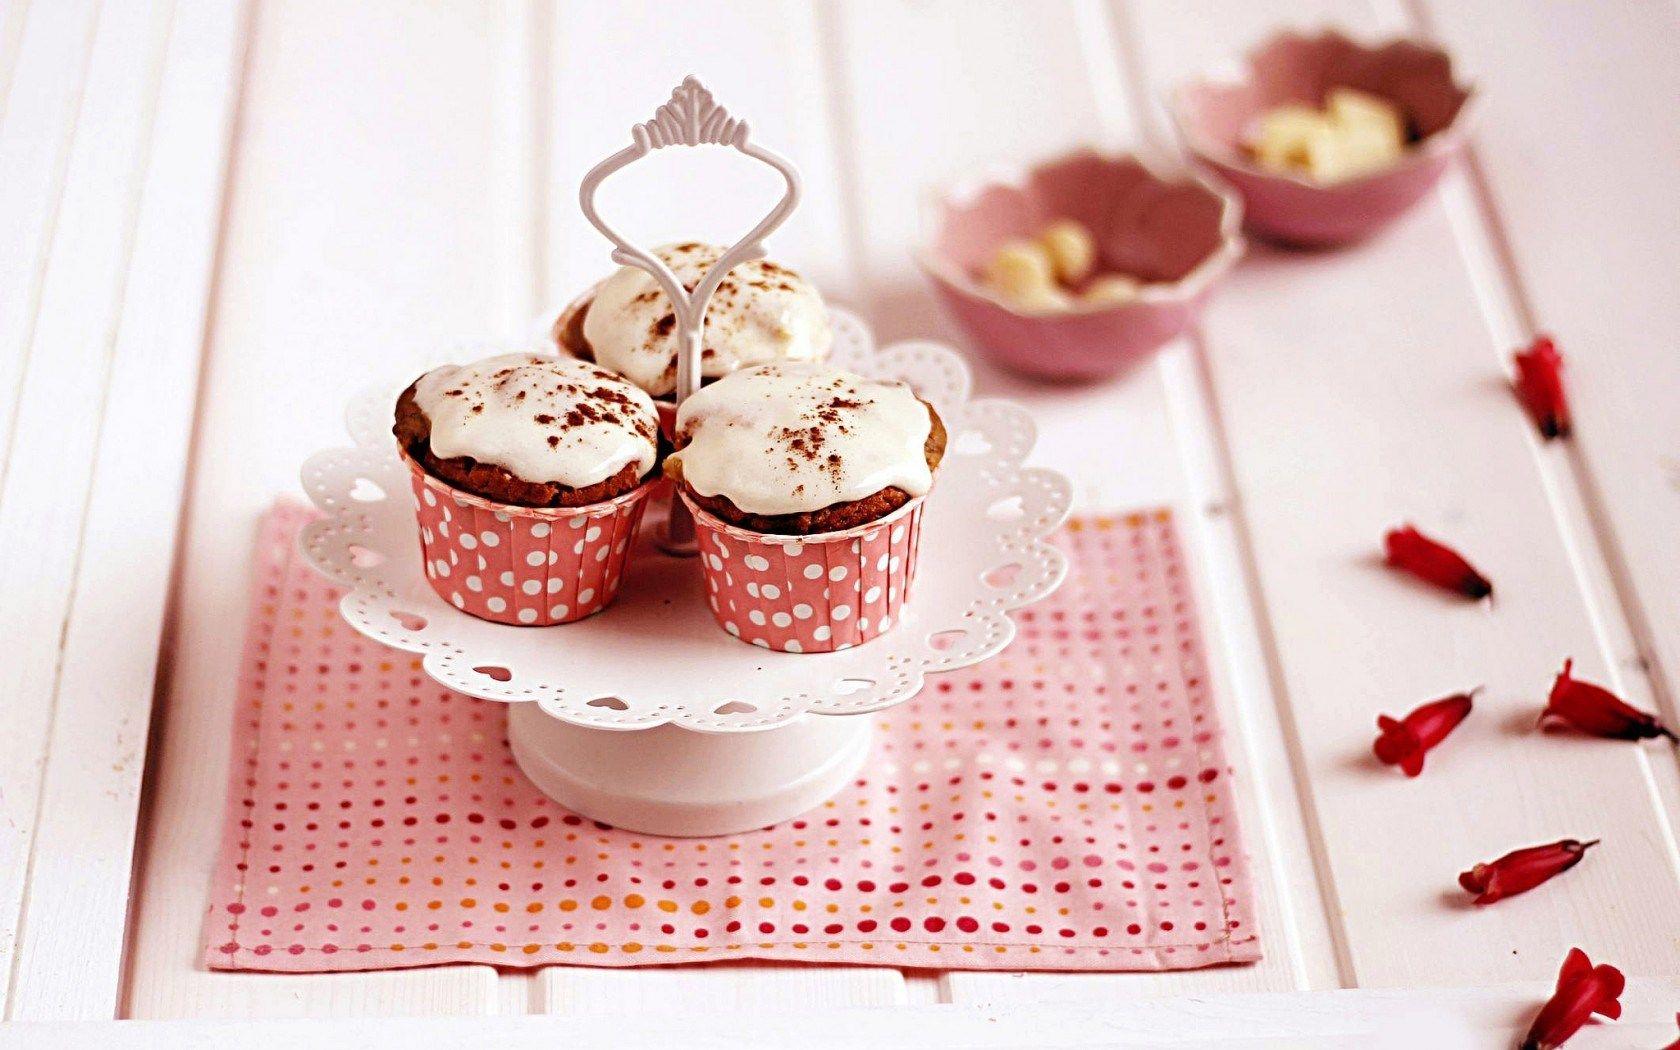 Cute Birthday Cupcake Wallpaper